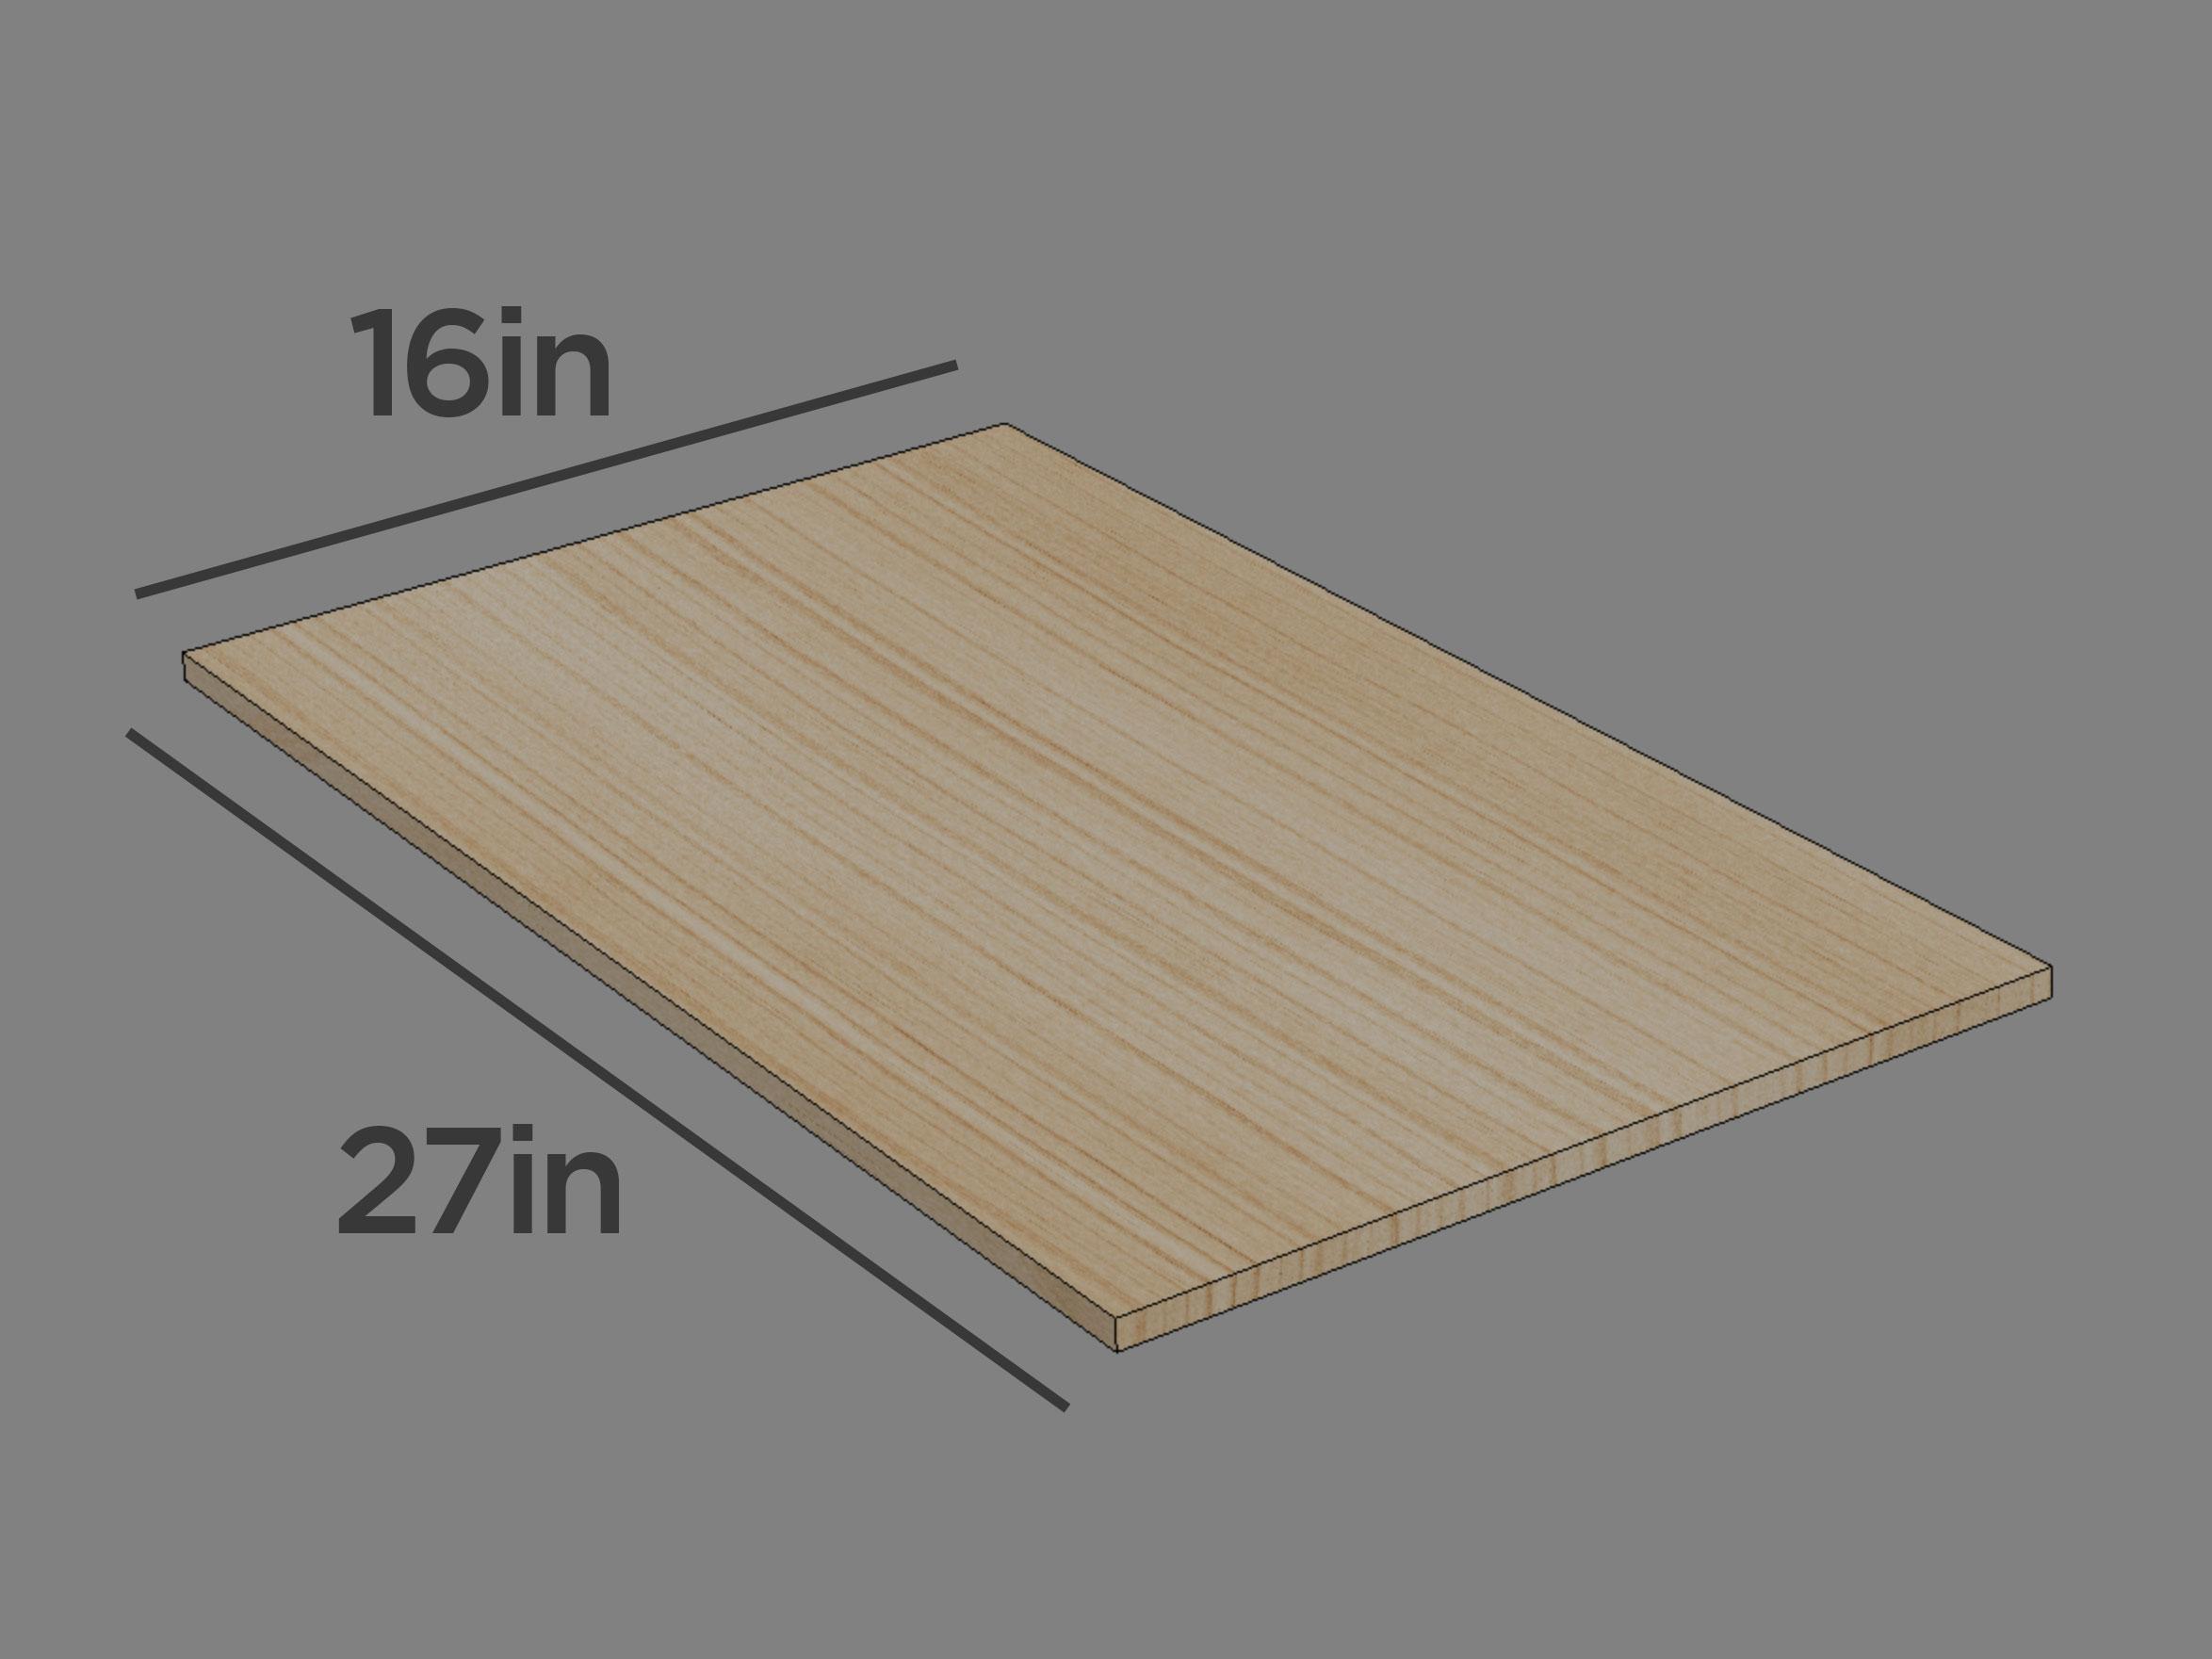 3d_printing_panel-step-5.jpg